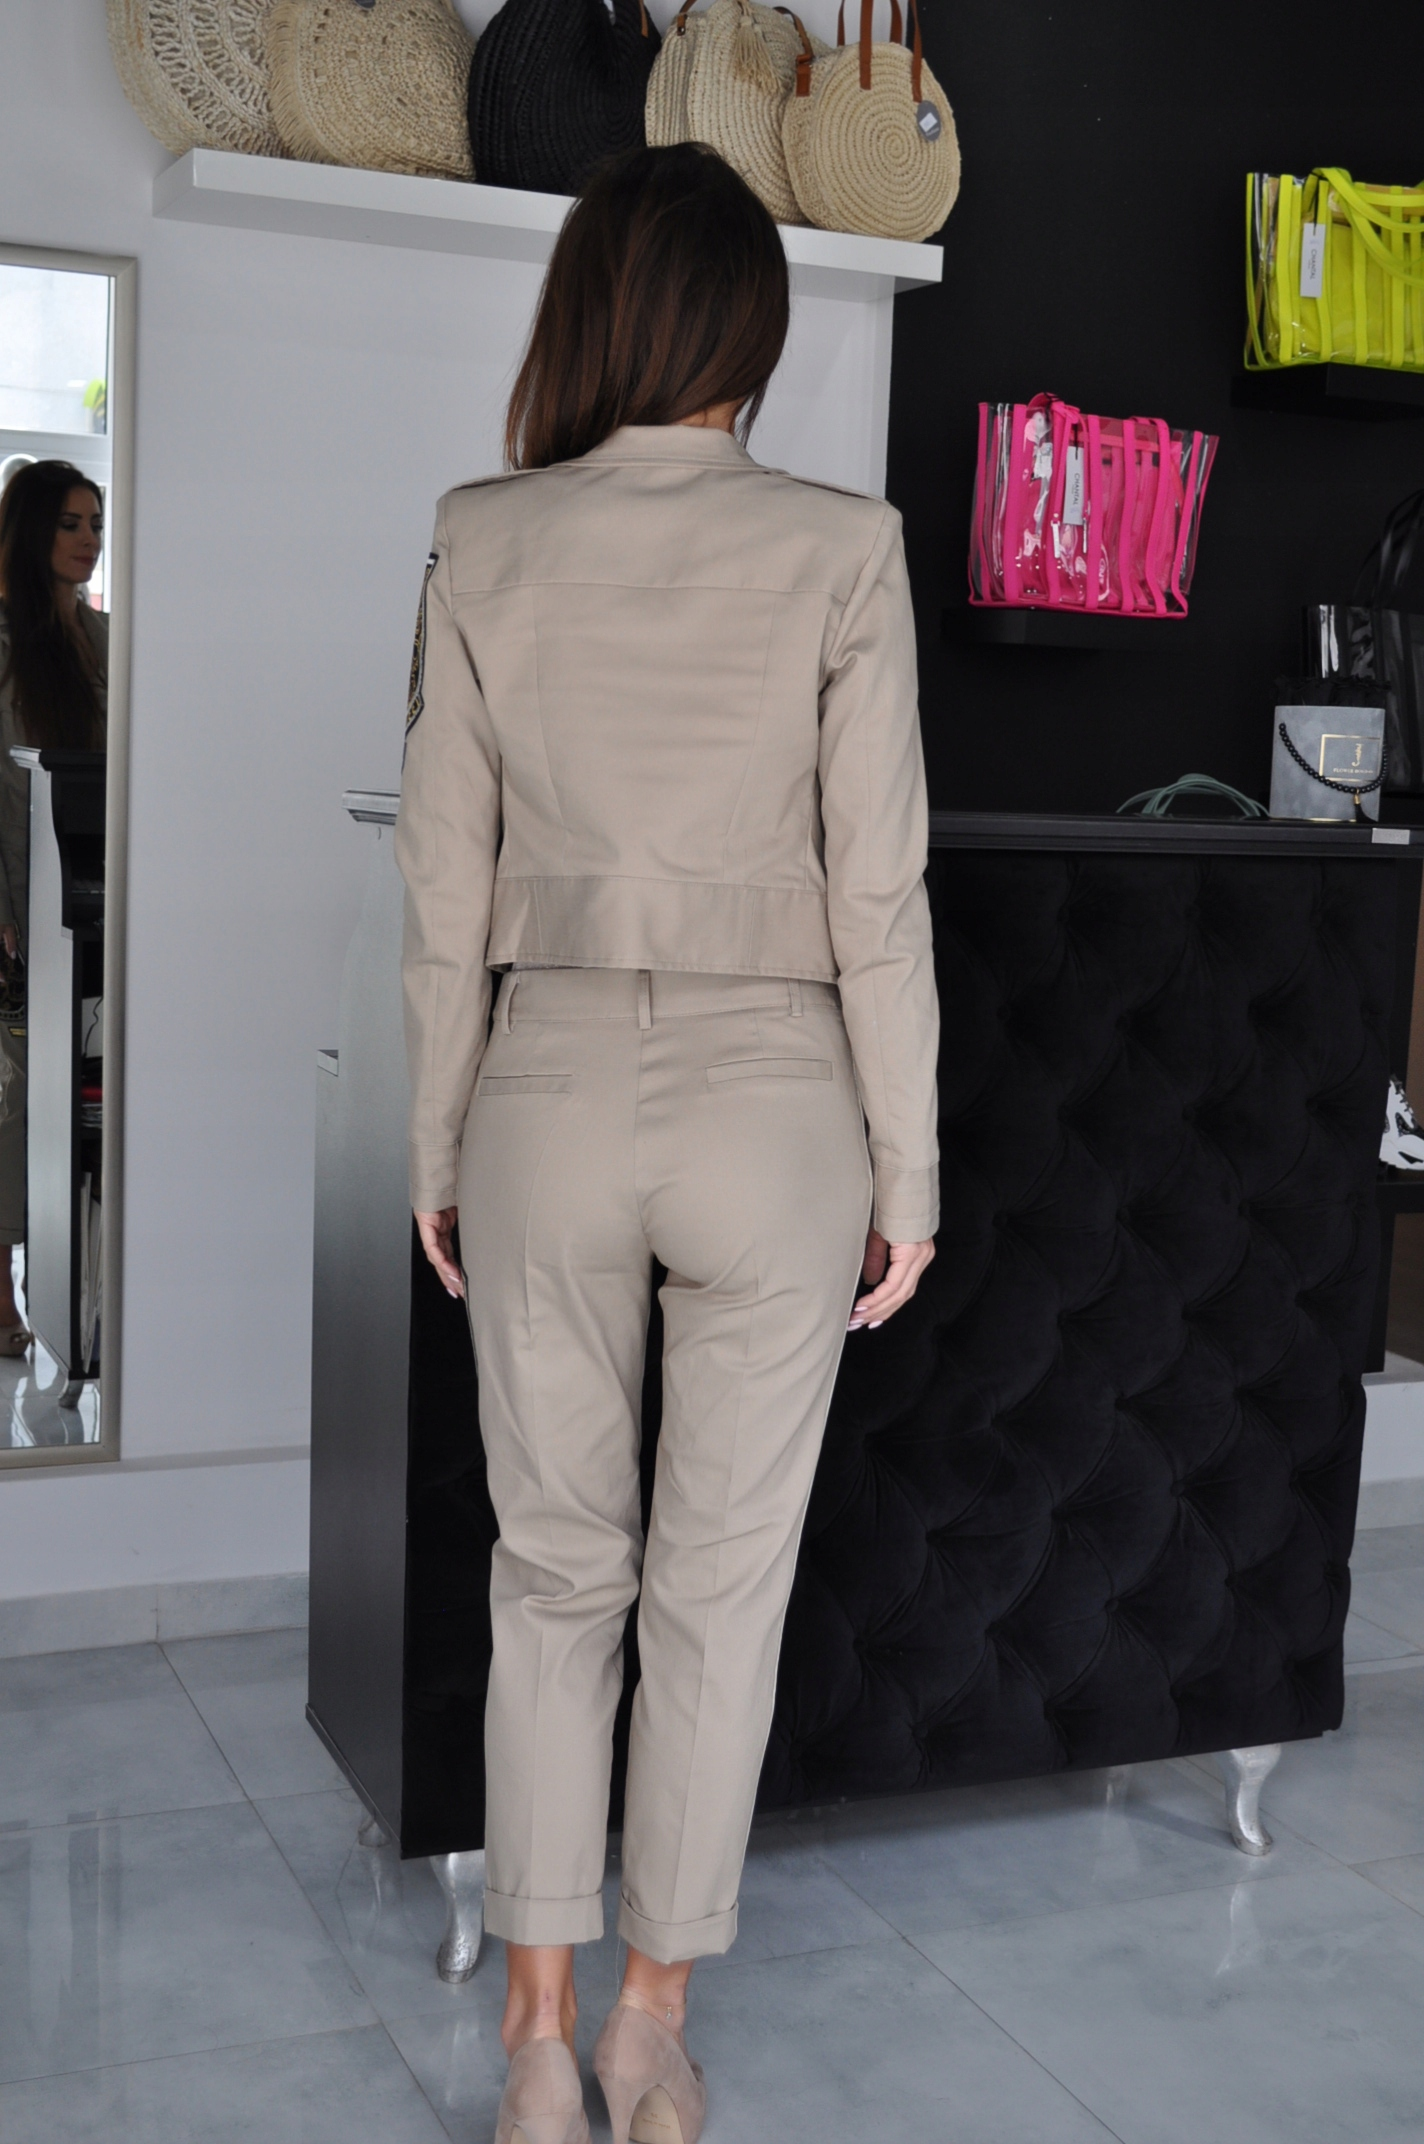 NEW Gil santucci spodnie wiosna lato 2020